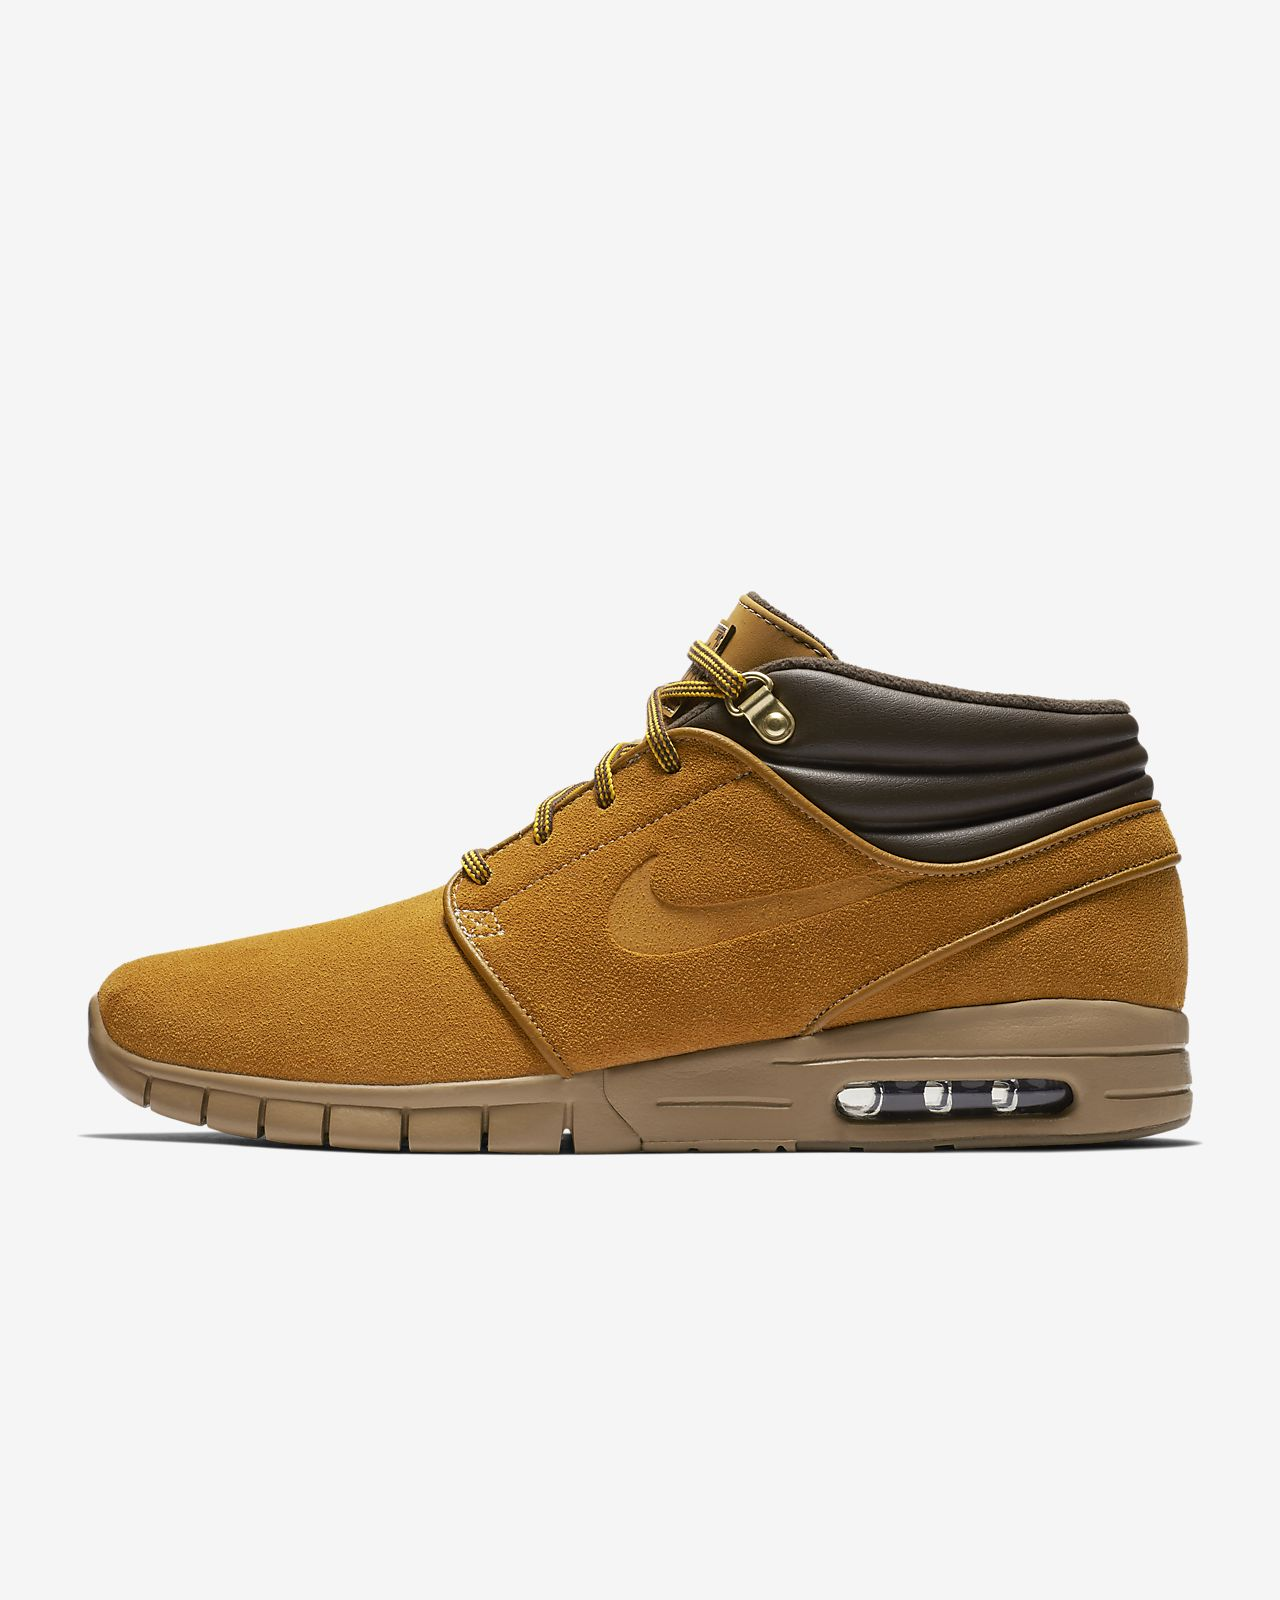 separation shoes 71799 8ae7a ... Męskie buty do skateboardingu Nike SB Stefan Janoski Max Mid Premium